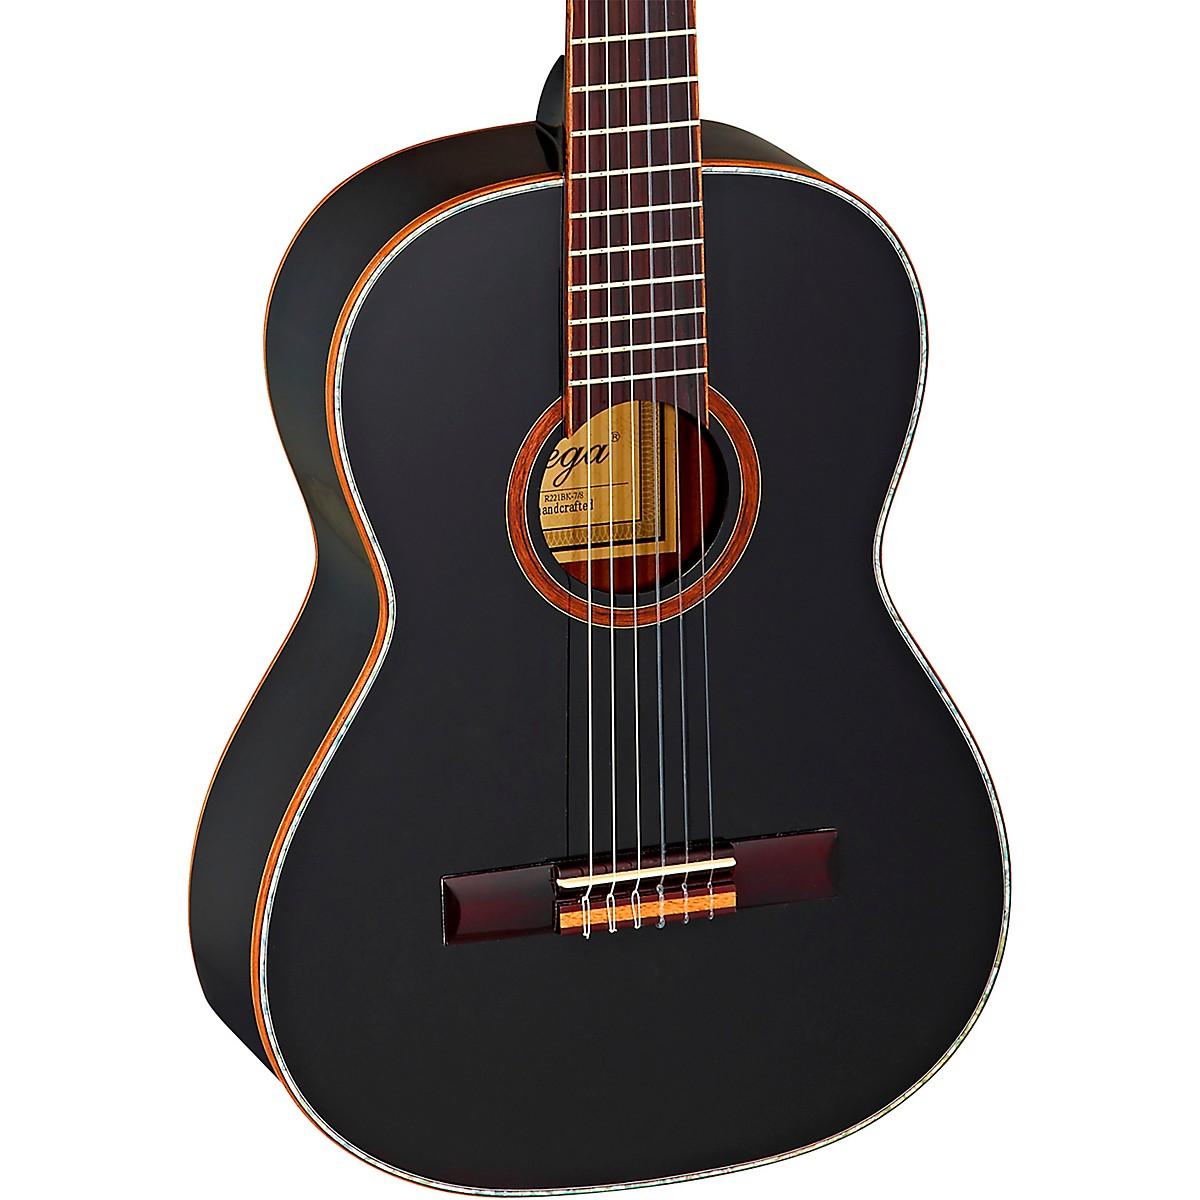 Ortega Family Series R221BK-7/8 7/8 Size Classical Guitar